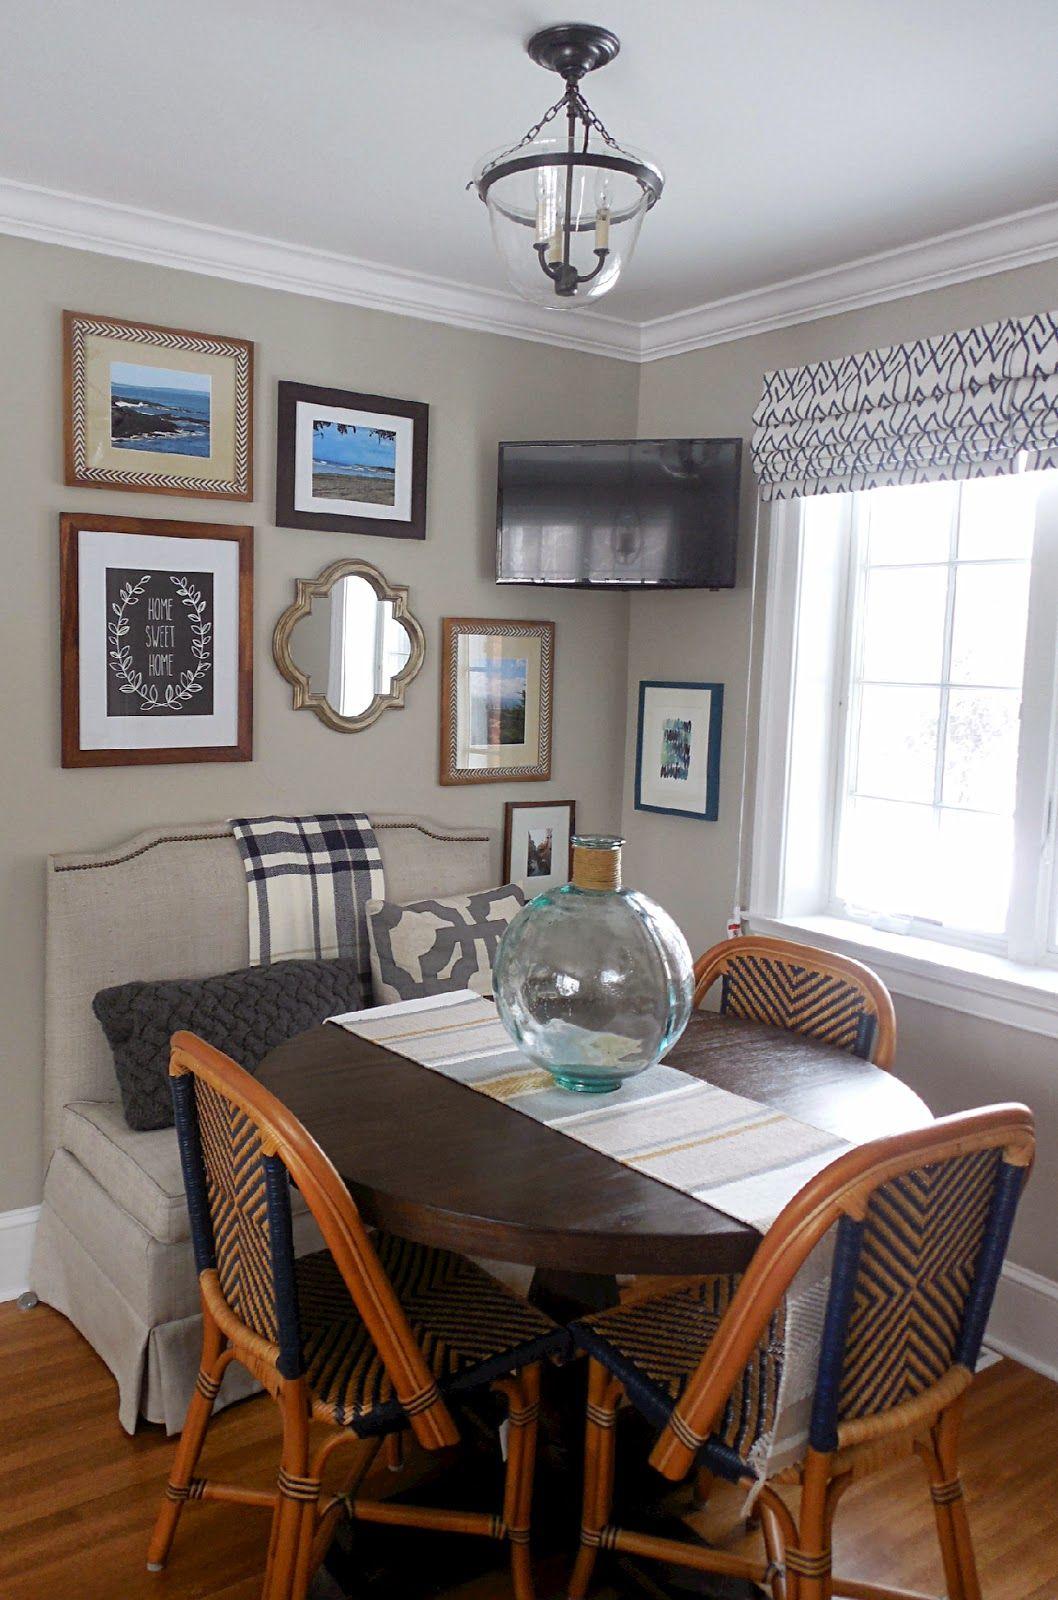 amber b design, amber balistreri, simple dwellings blog, interior